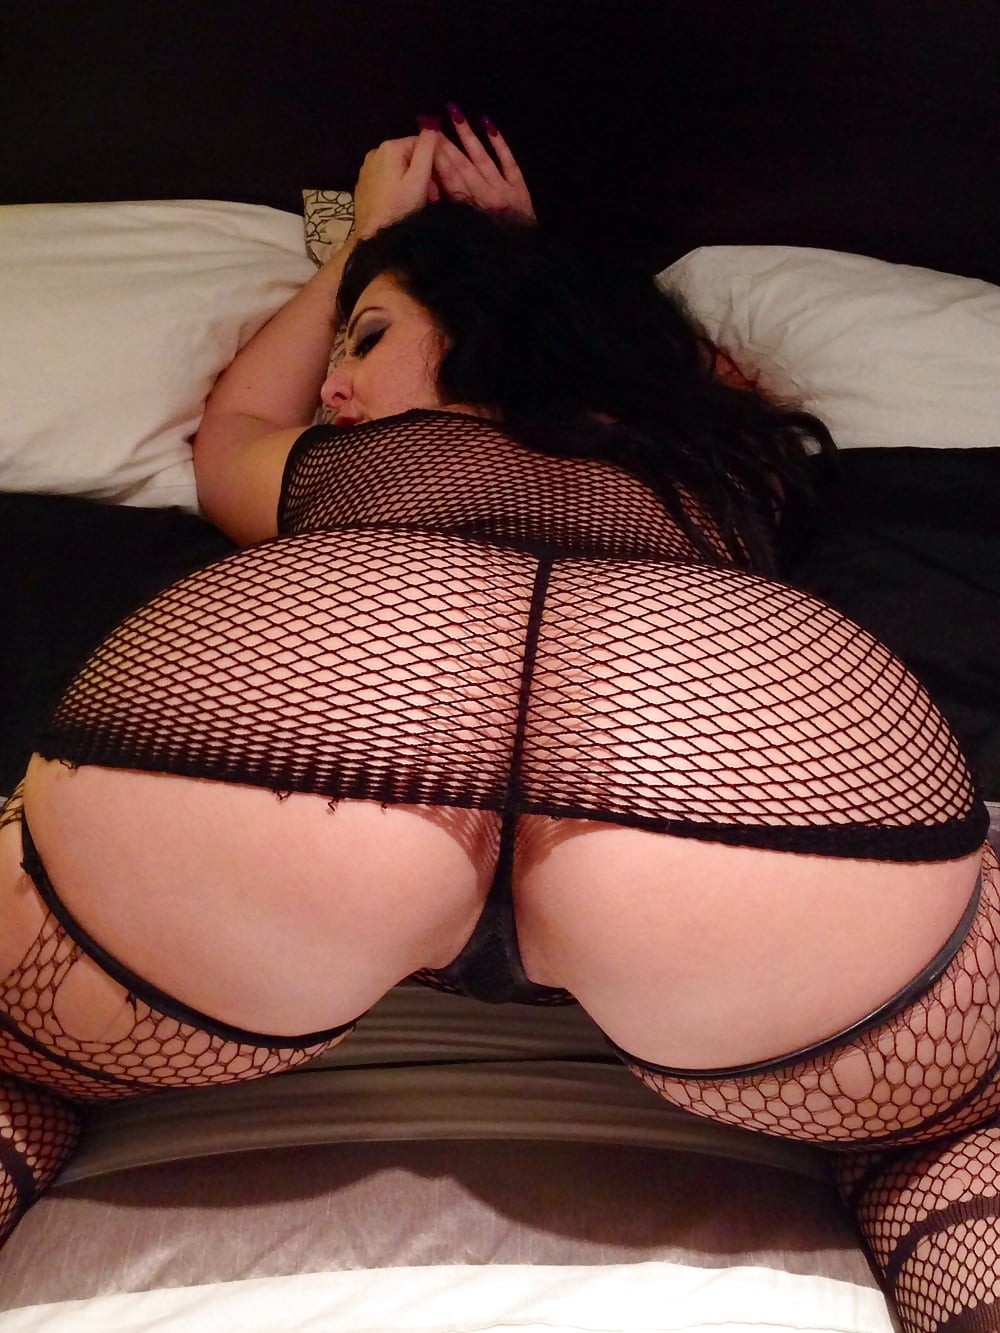 Persian girl ass, naked drunk girl porn gif